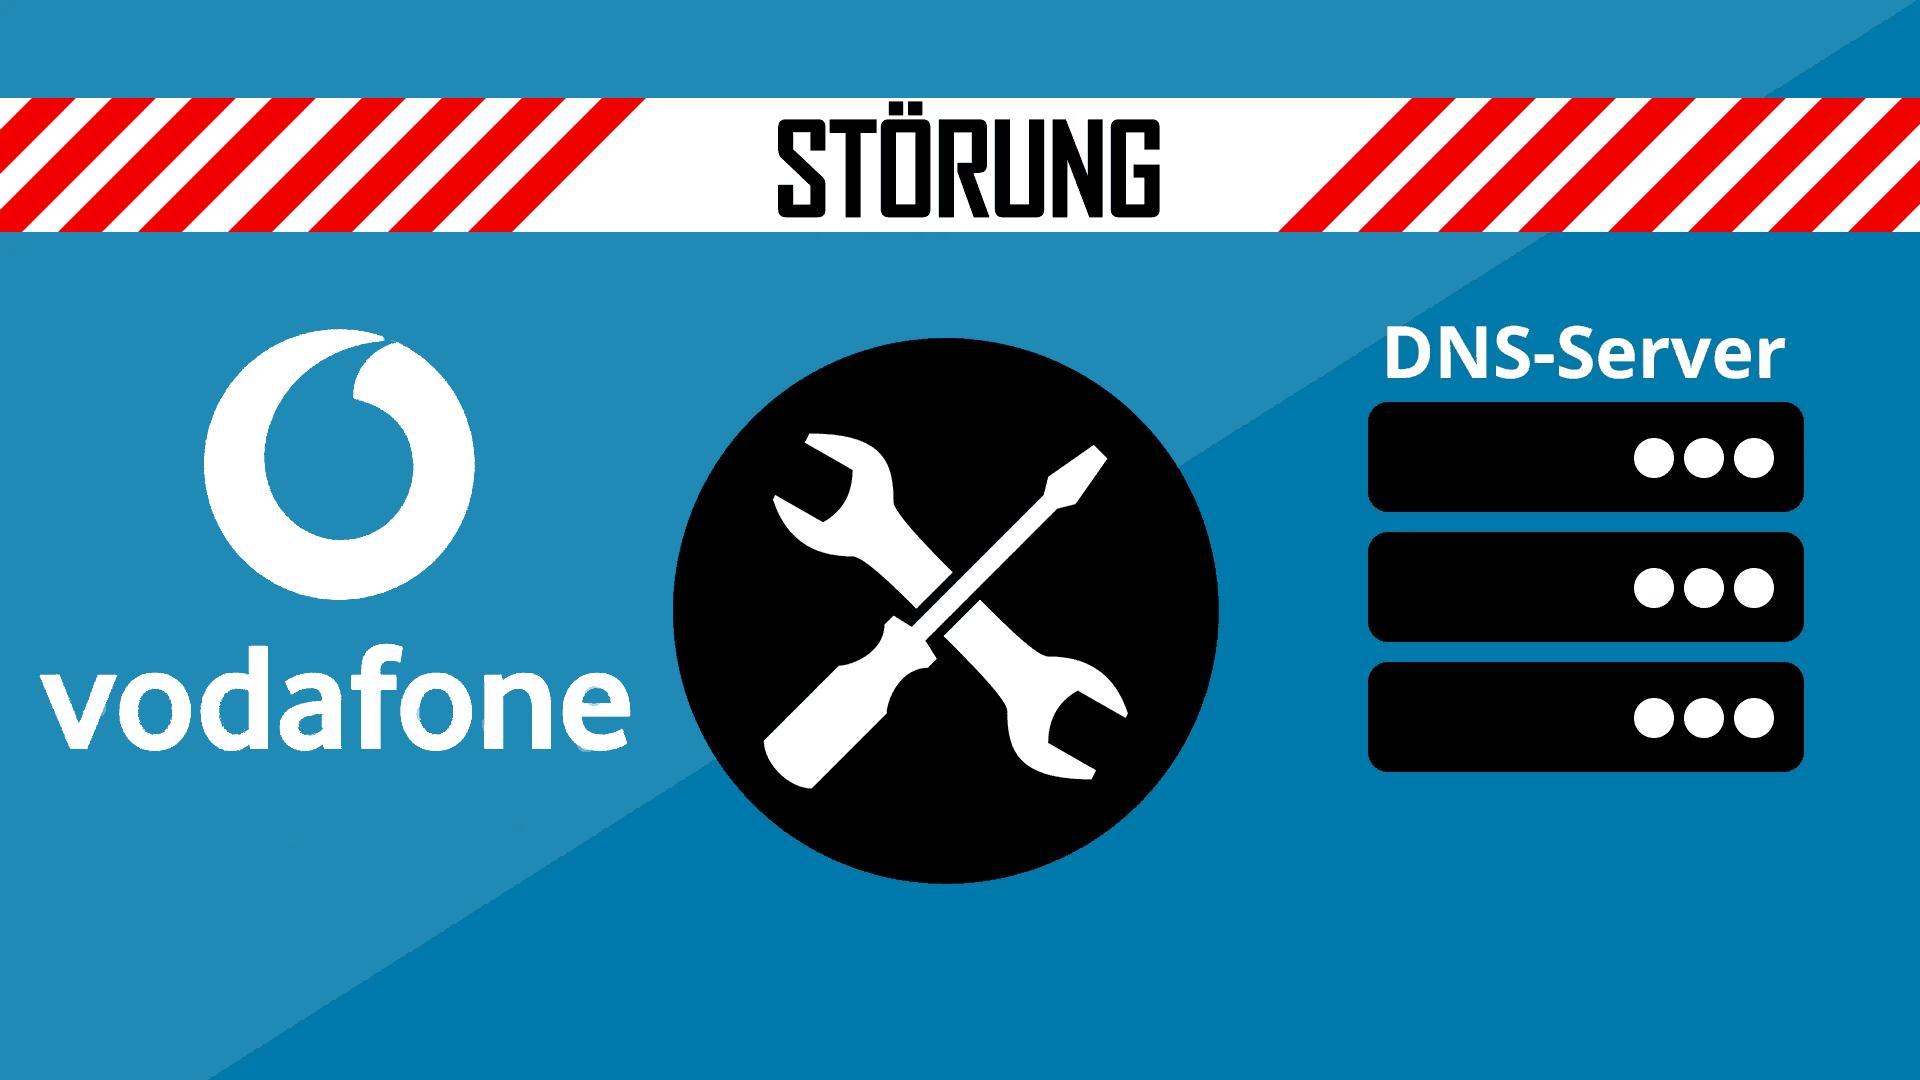 Vodafone Dns Störung